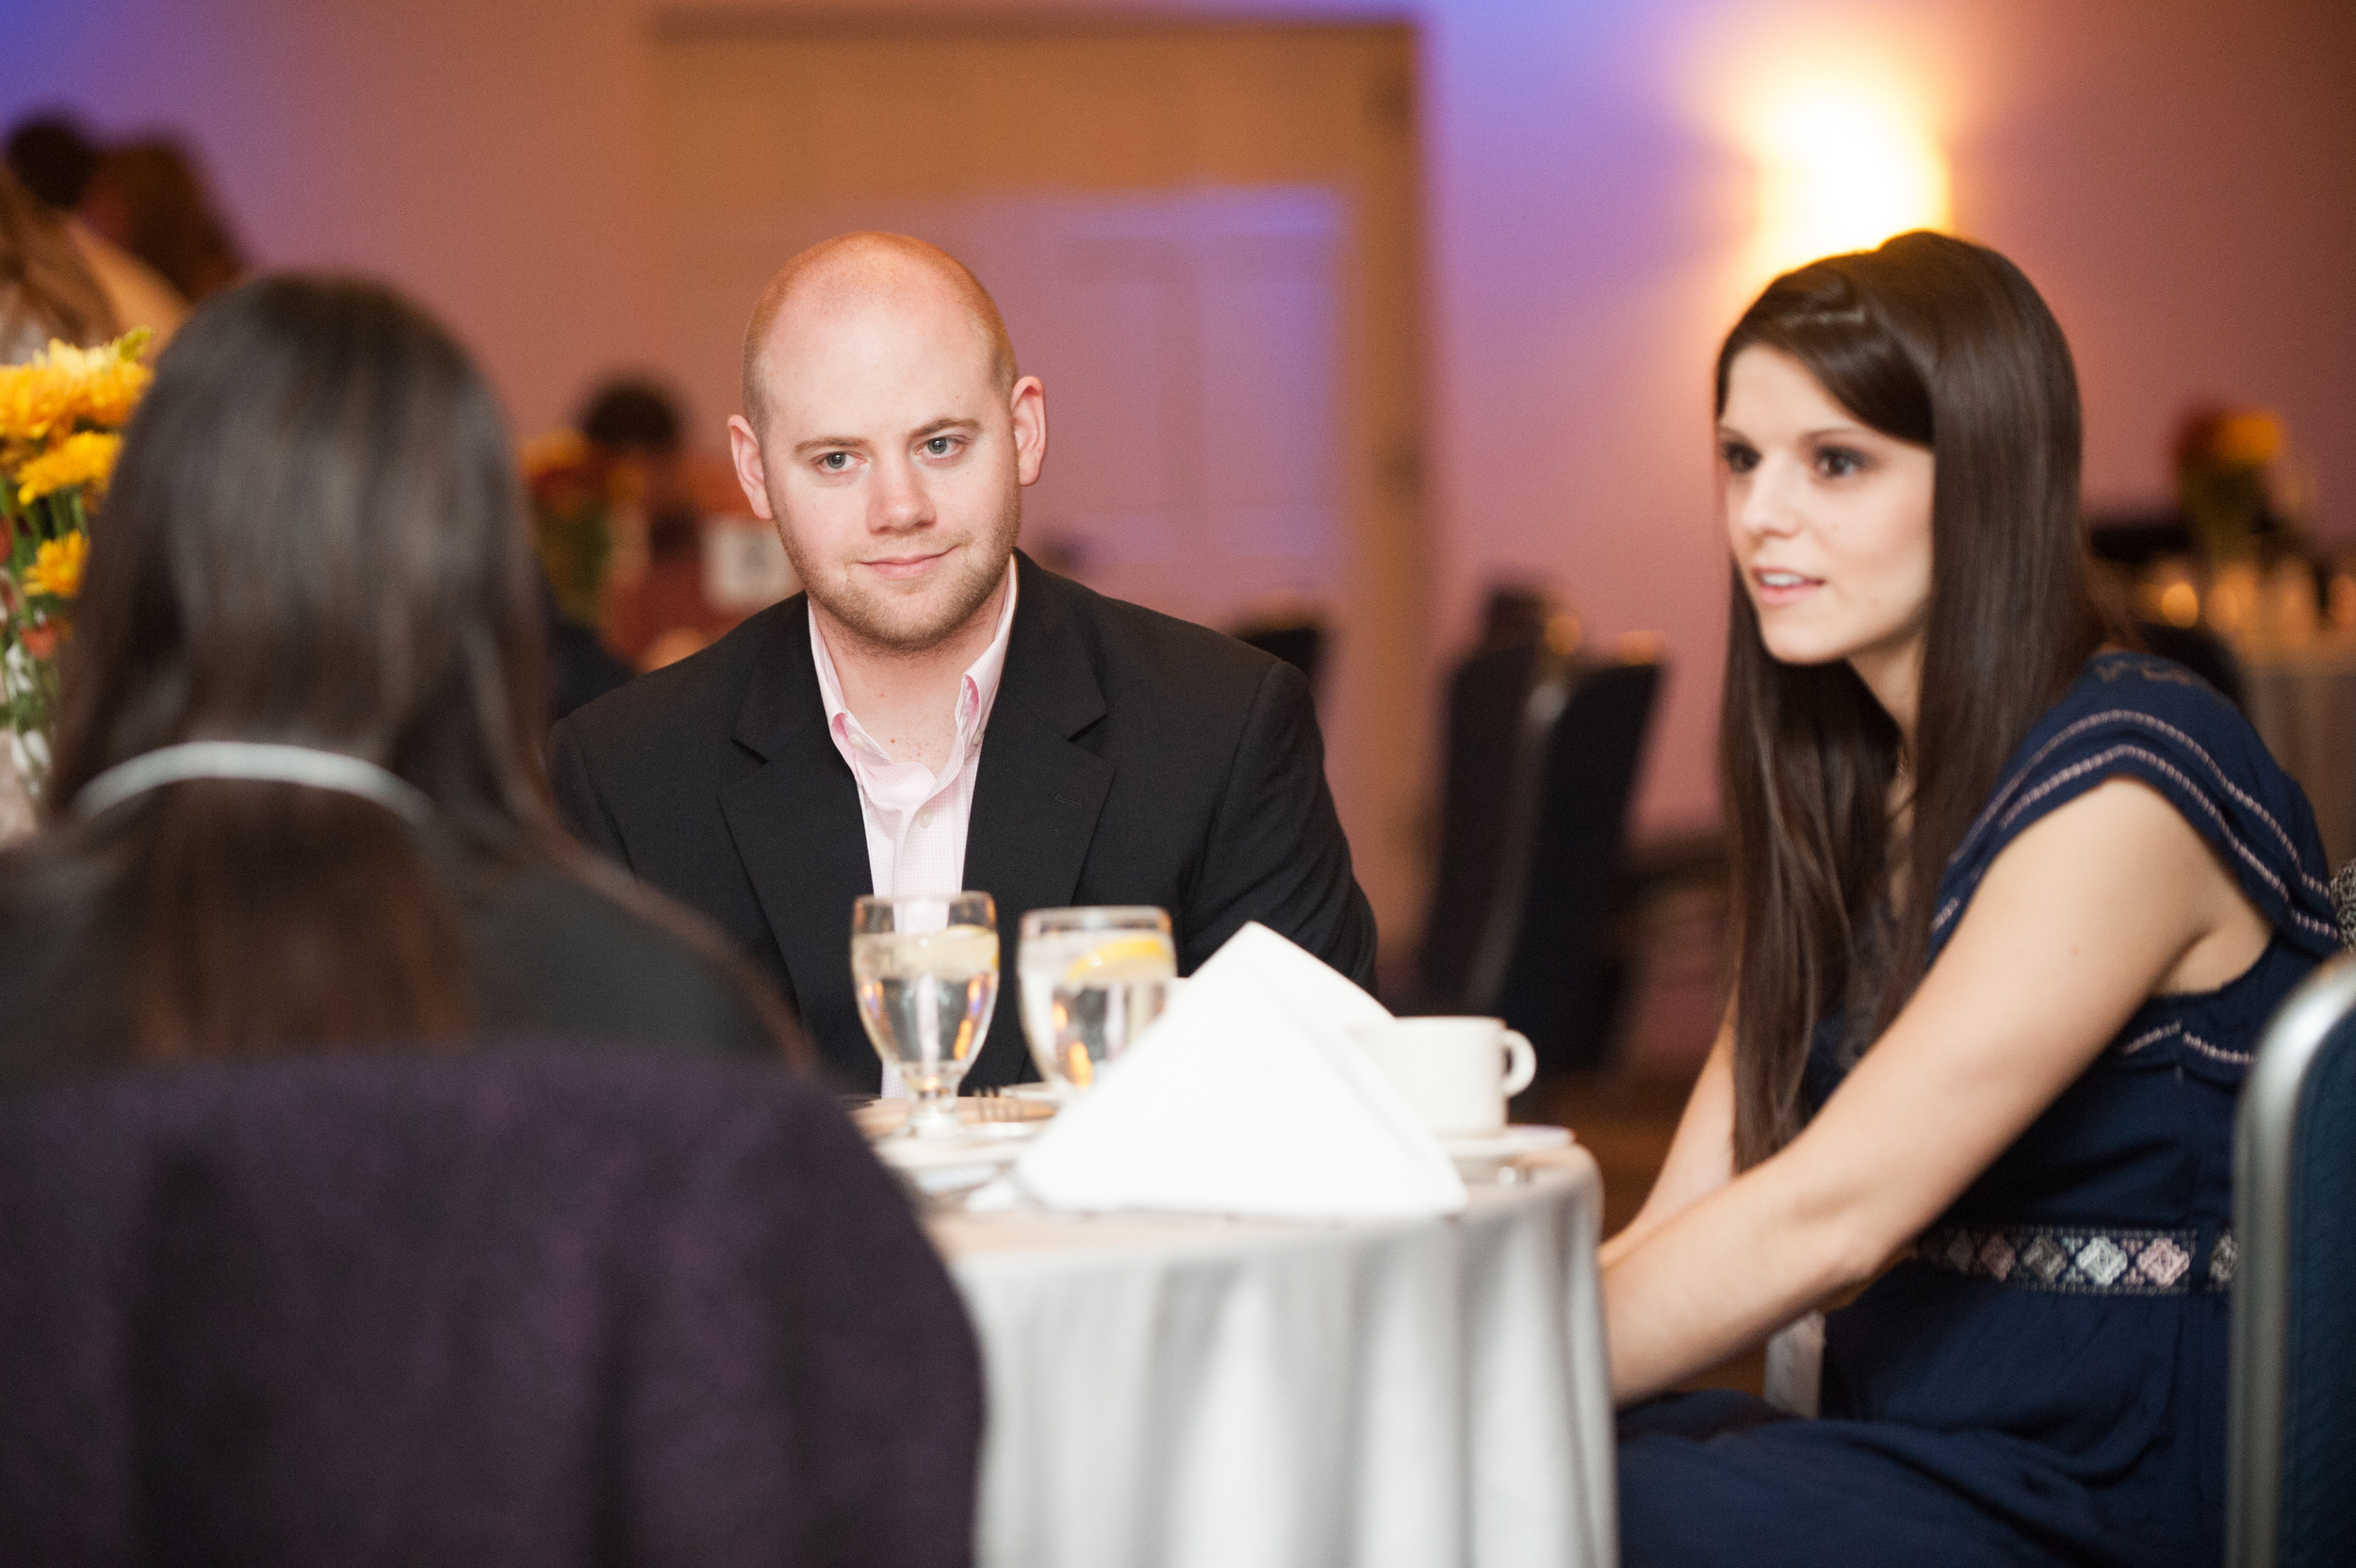 2014-11-15-ABACS Annual Dinner-43.jpg